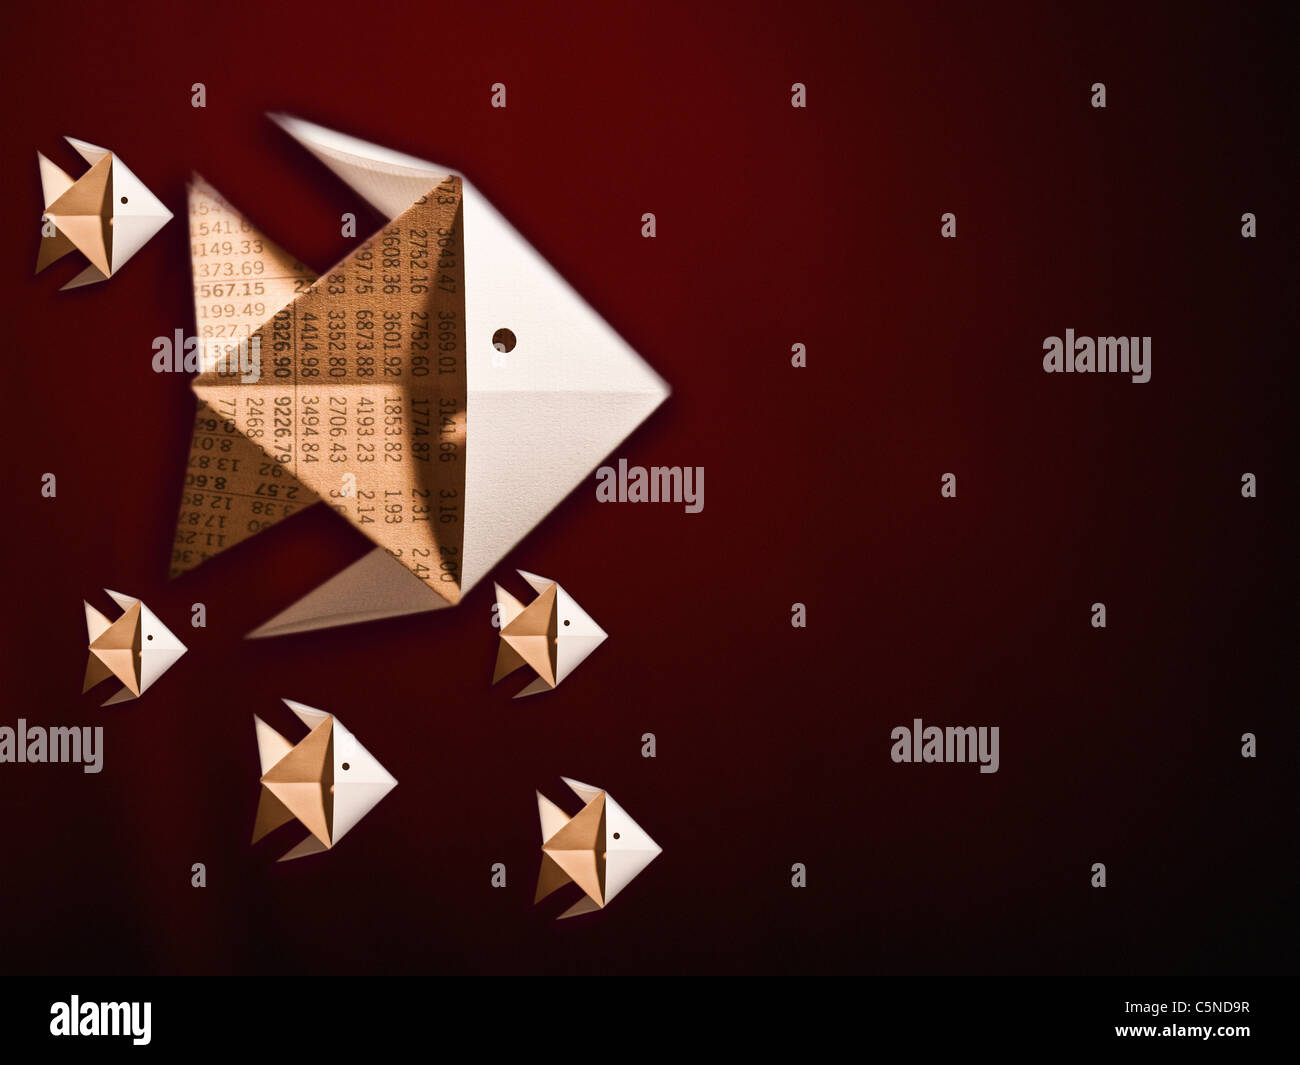 Origami Fisch aus finanziellen Papier gefertigt Stockbild